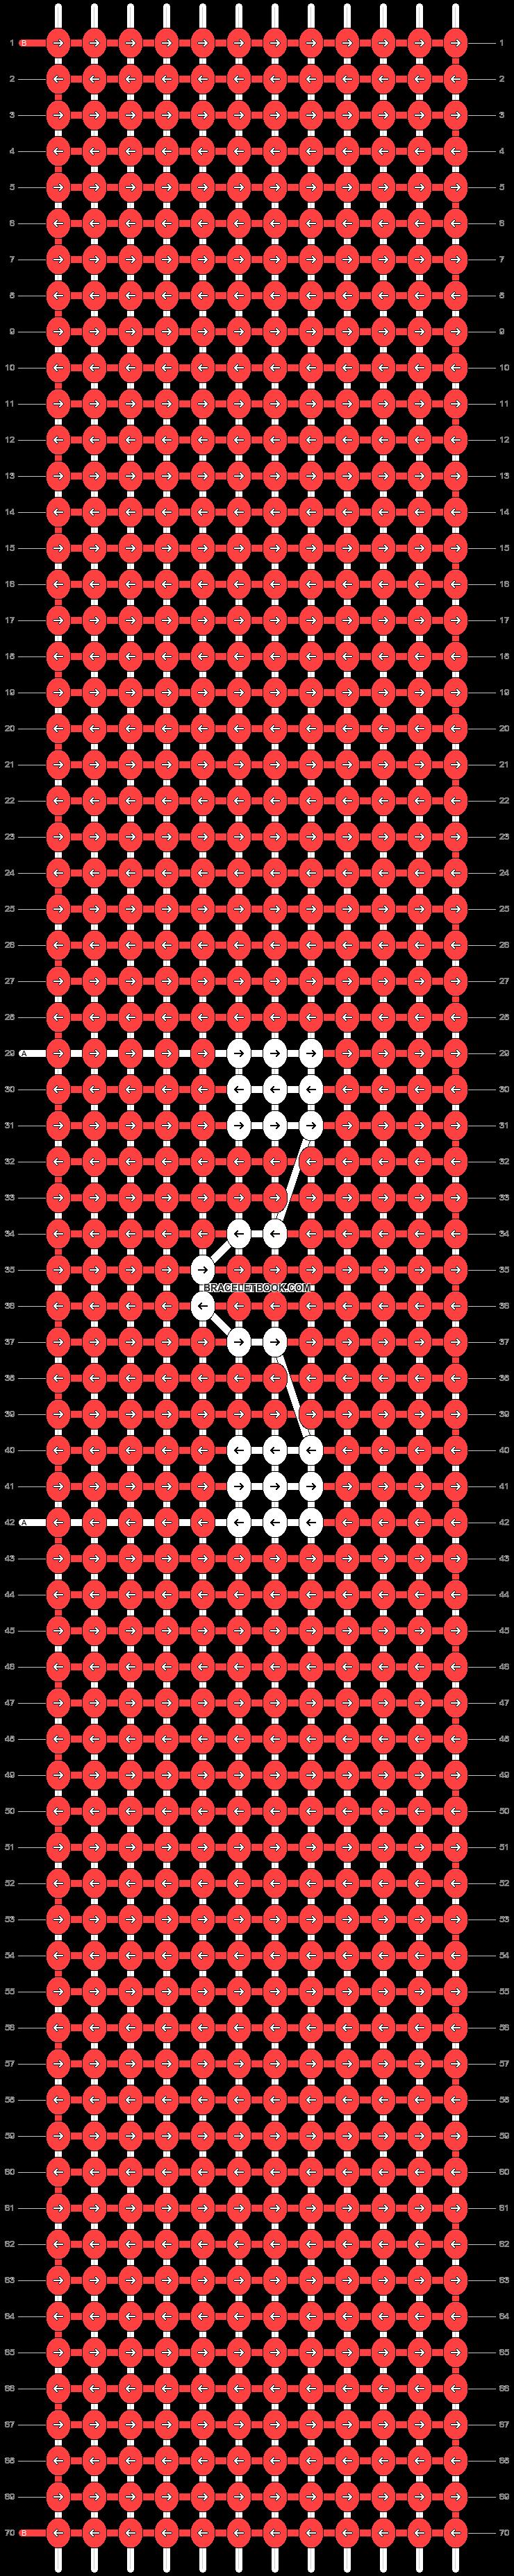 Alpha pattern #44189 variation #110037 pattern